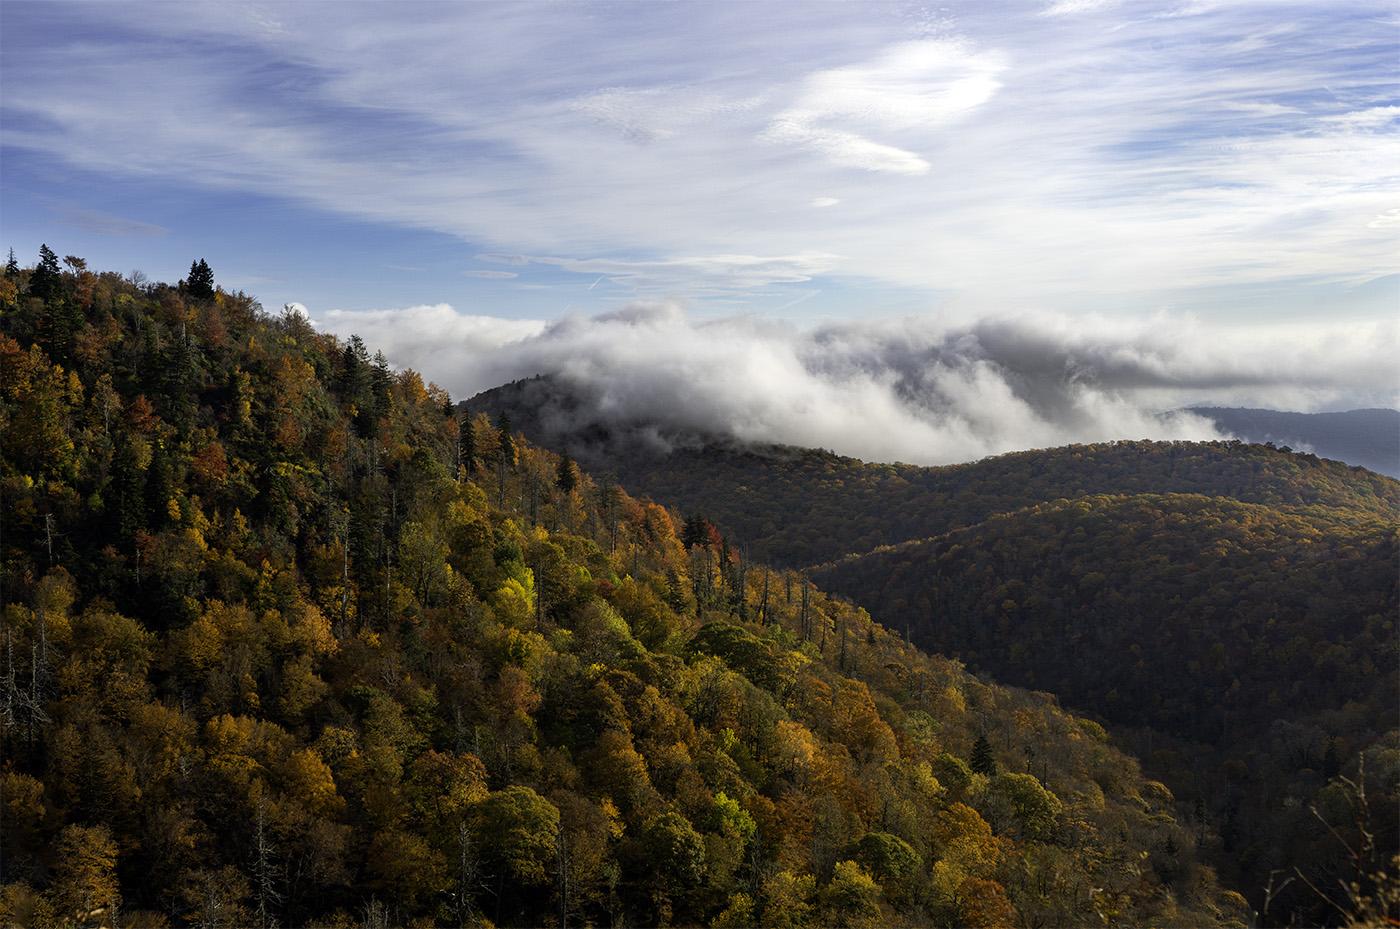 Fall tours in the Blue Ridge Mountains